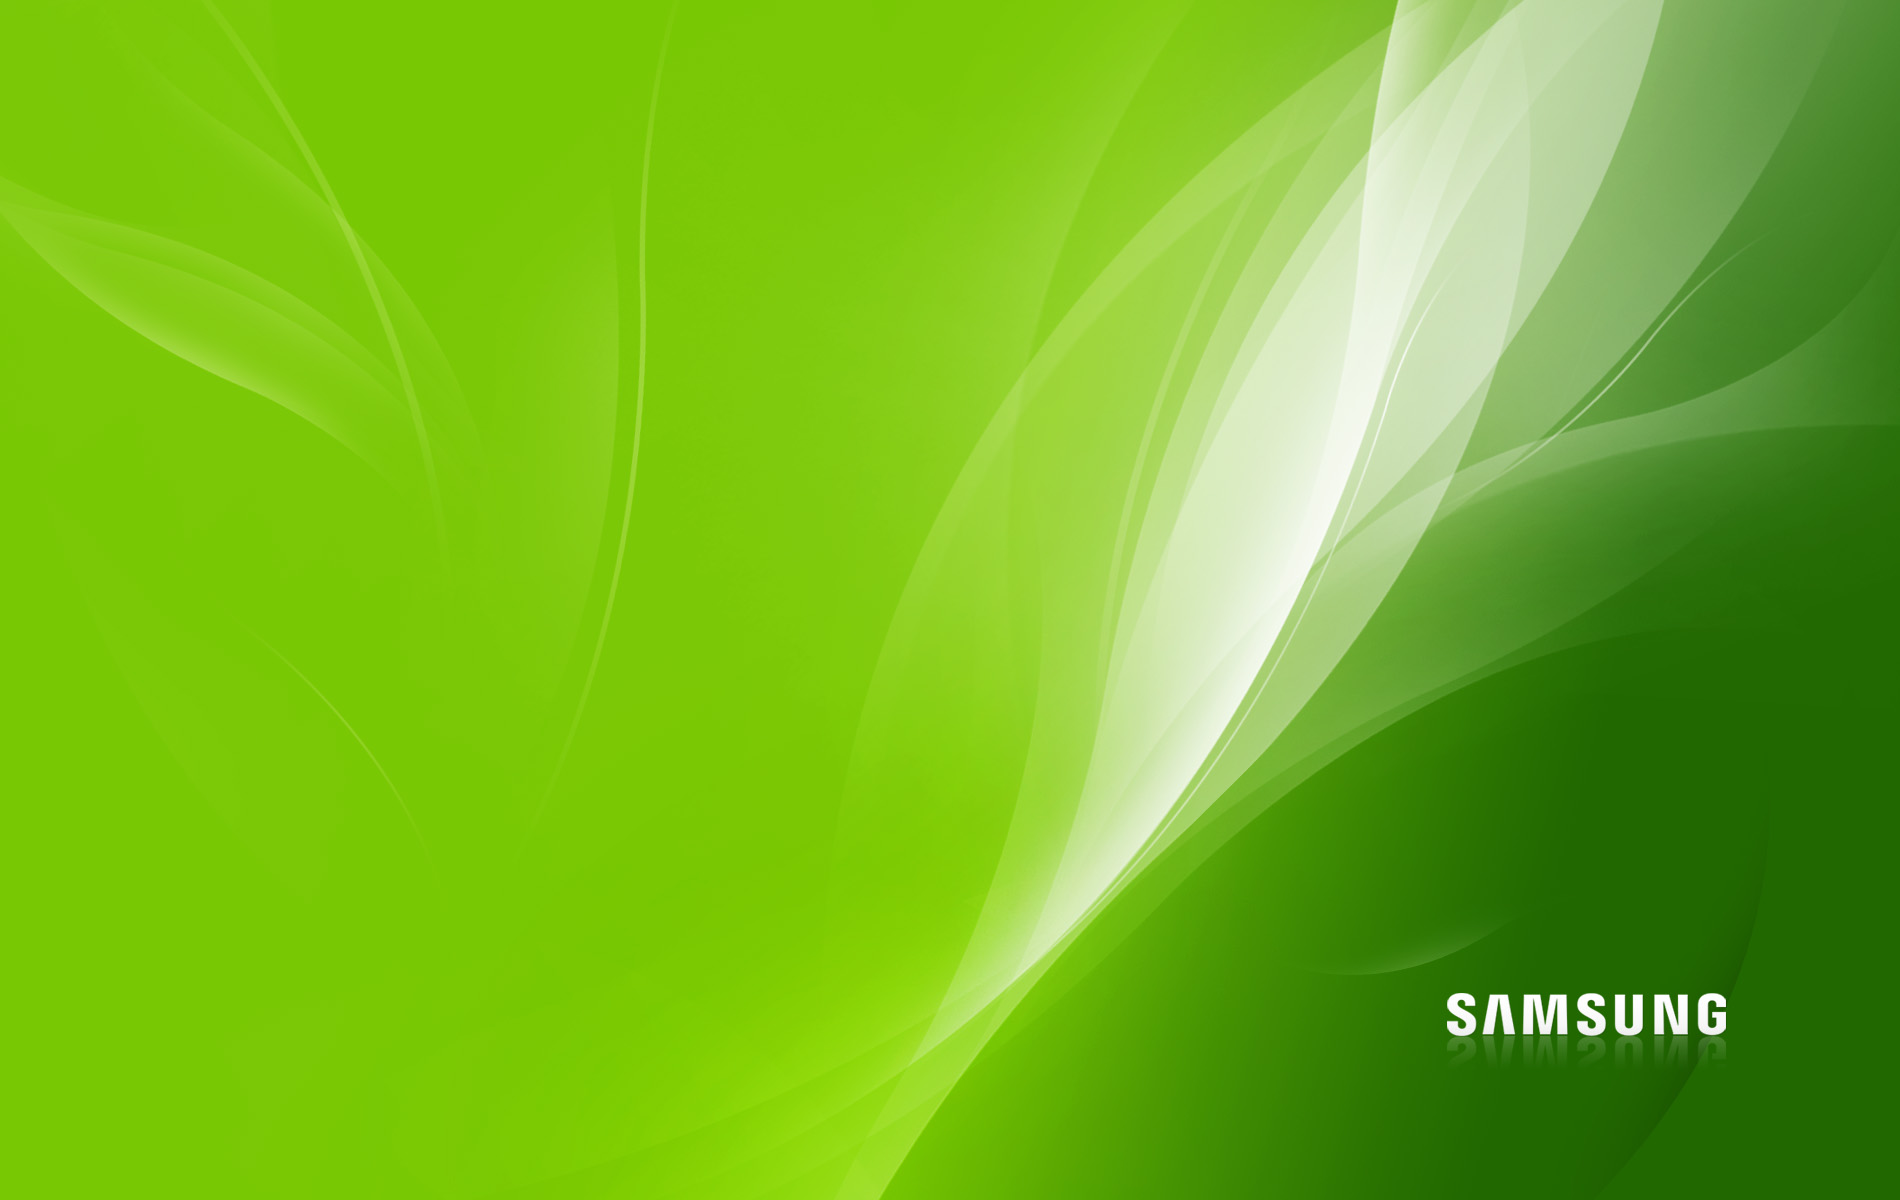 Samsung Backgrounds